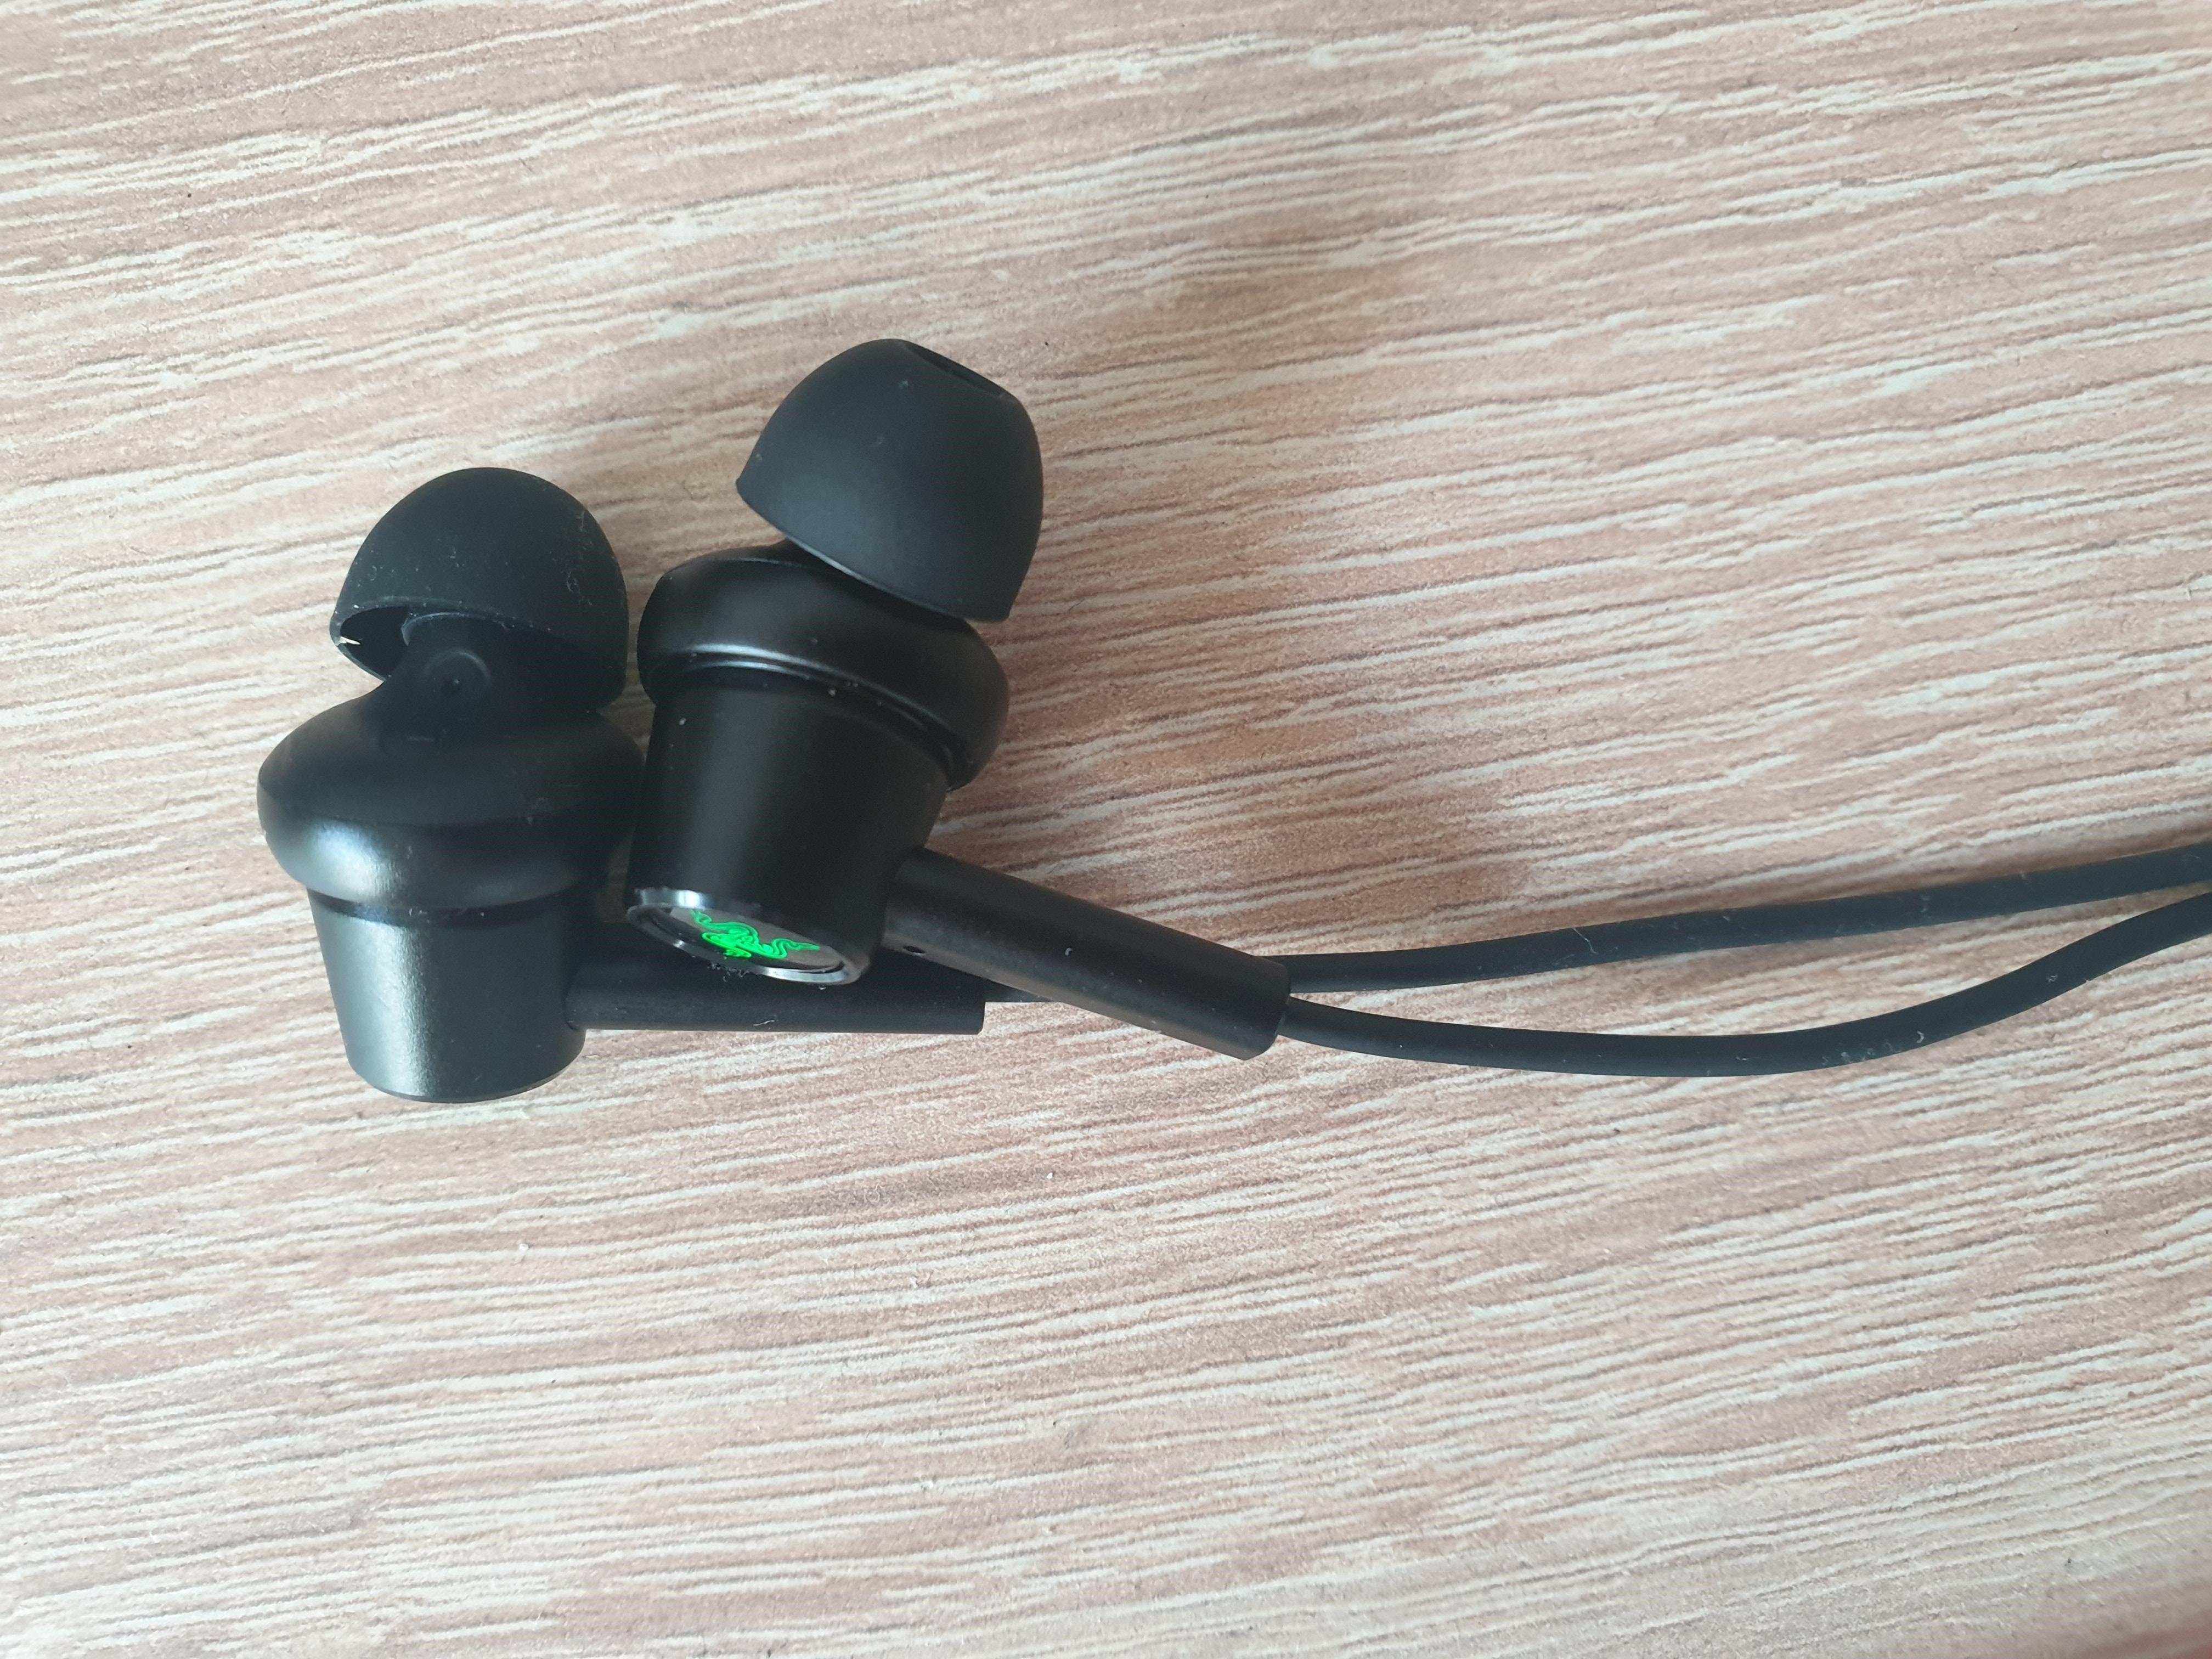 Image of Razer Hammerhead earbuds